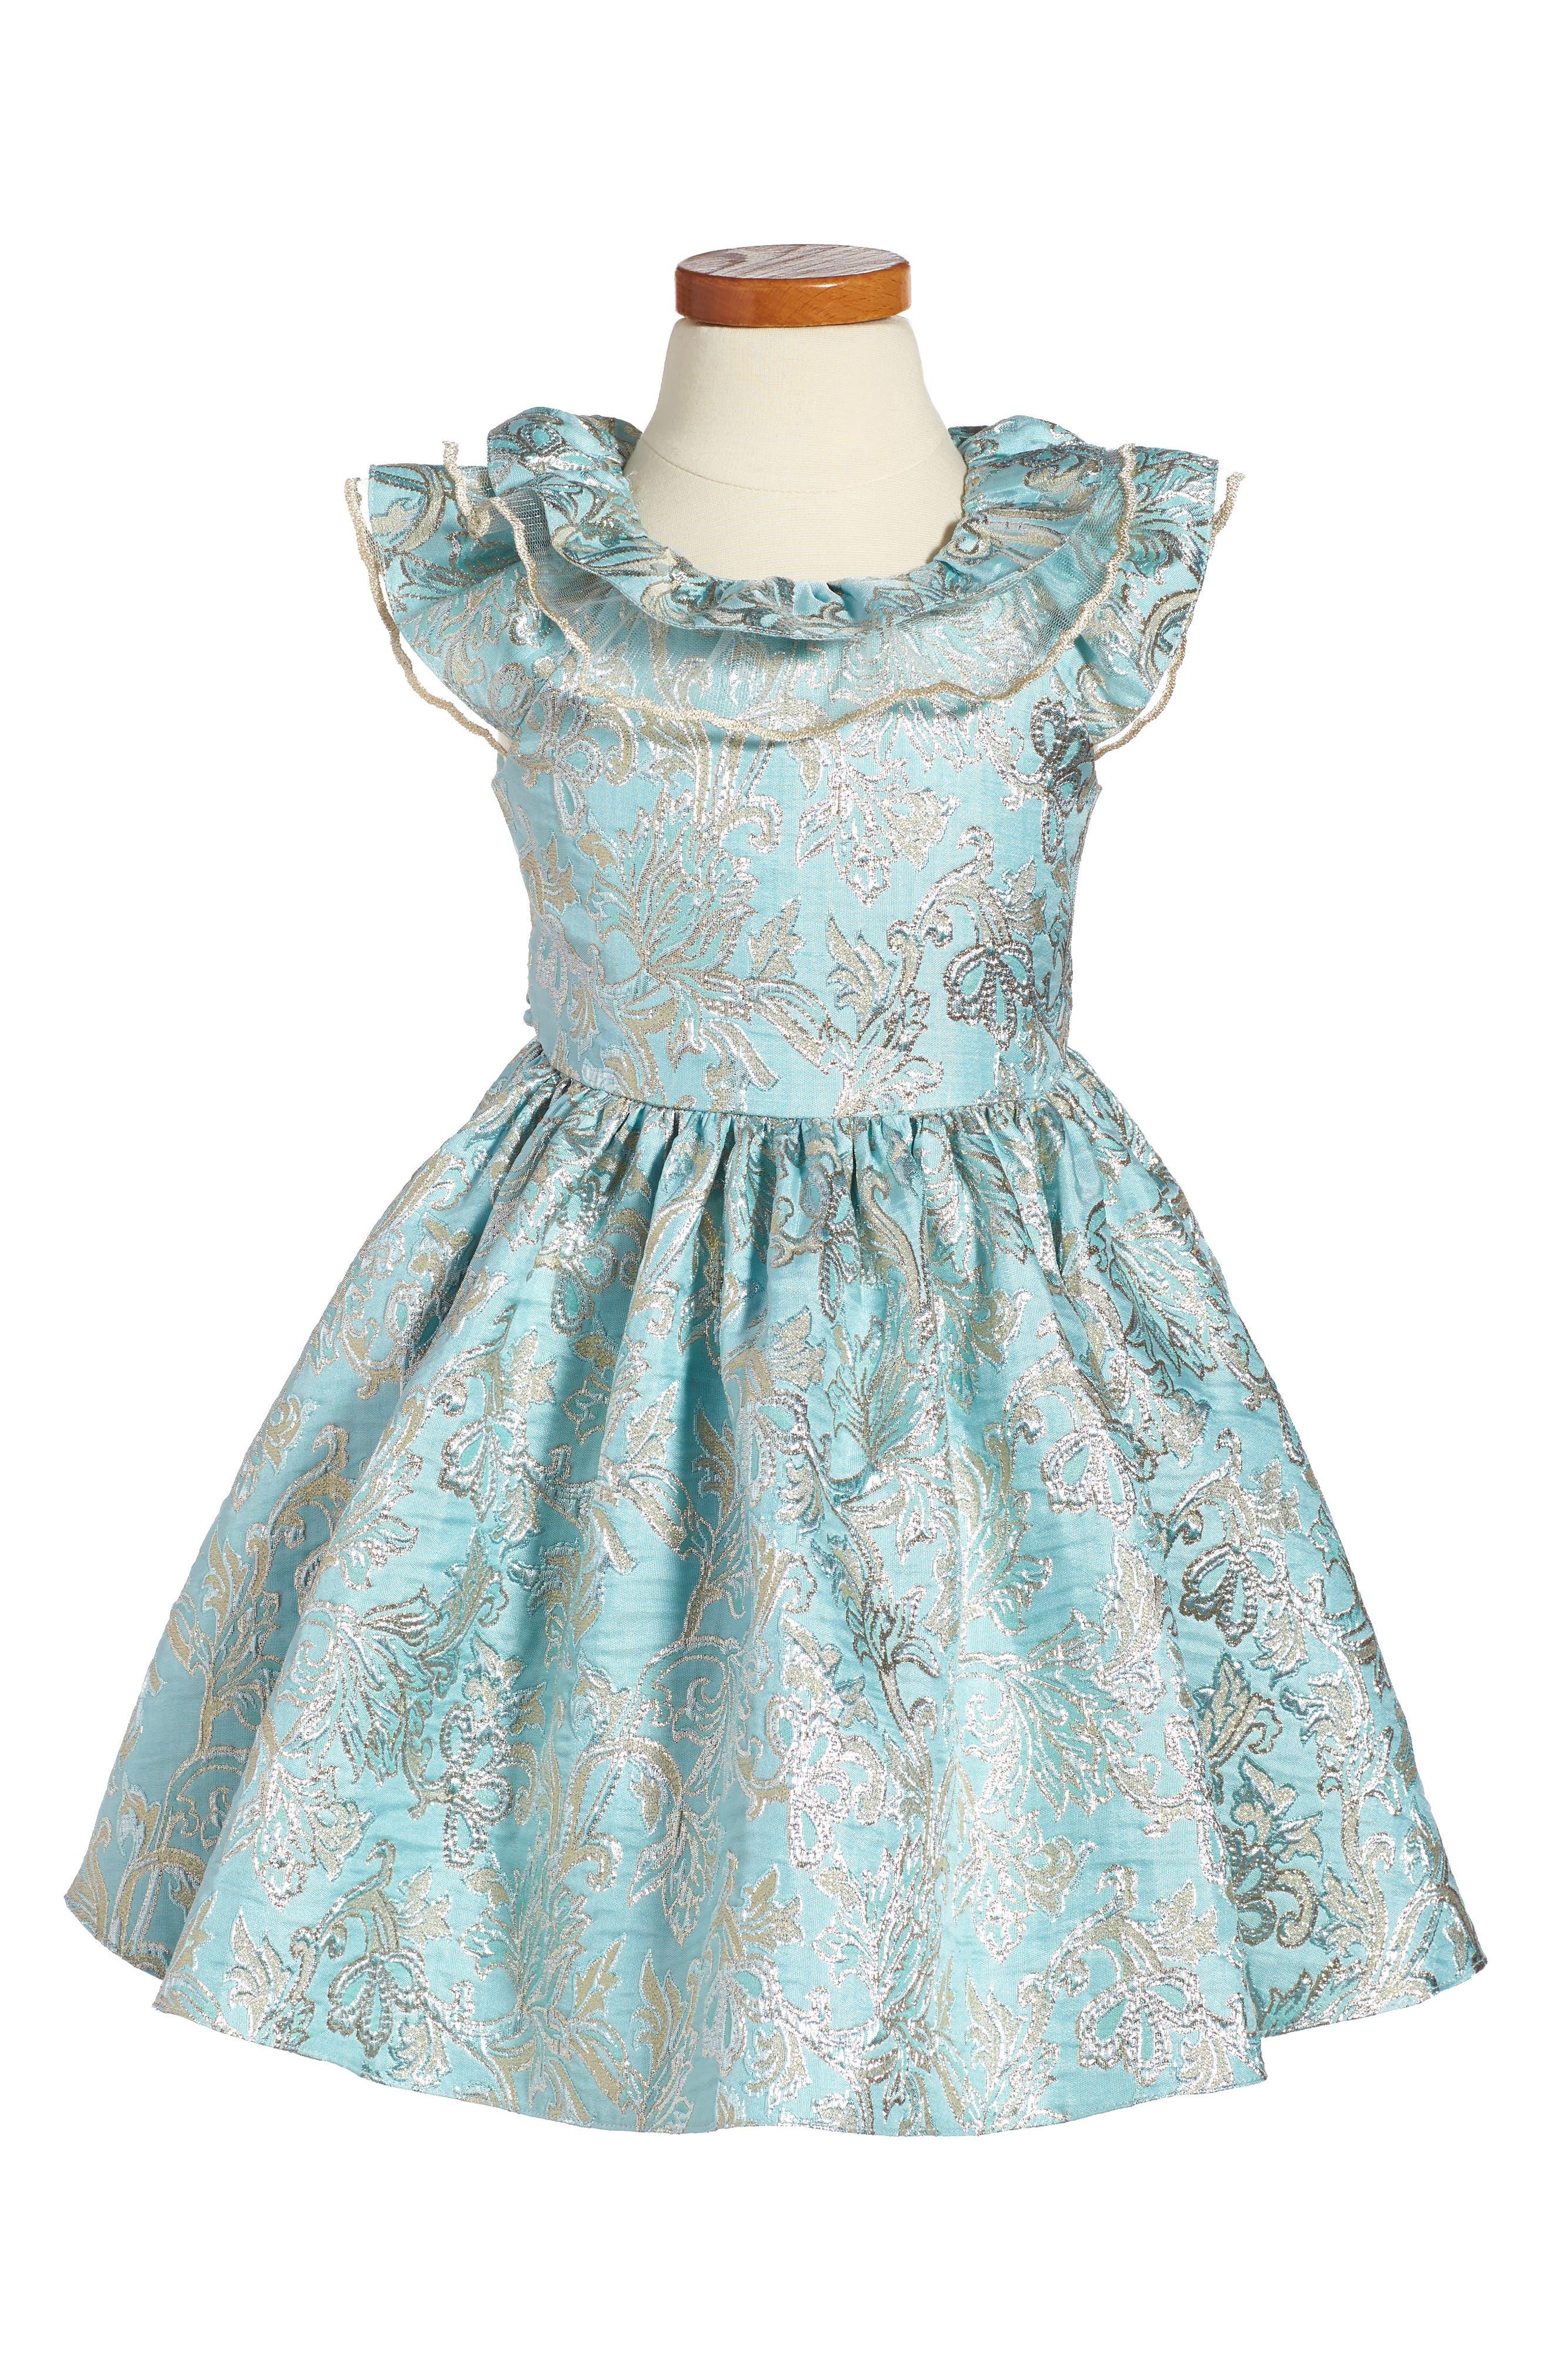 Alternate Image 1 Selected - David Chales Ruffle Neck Brocade Dress (Toddler Girls & Little Girls)